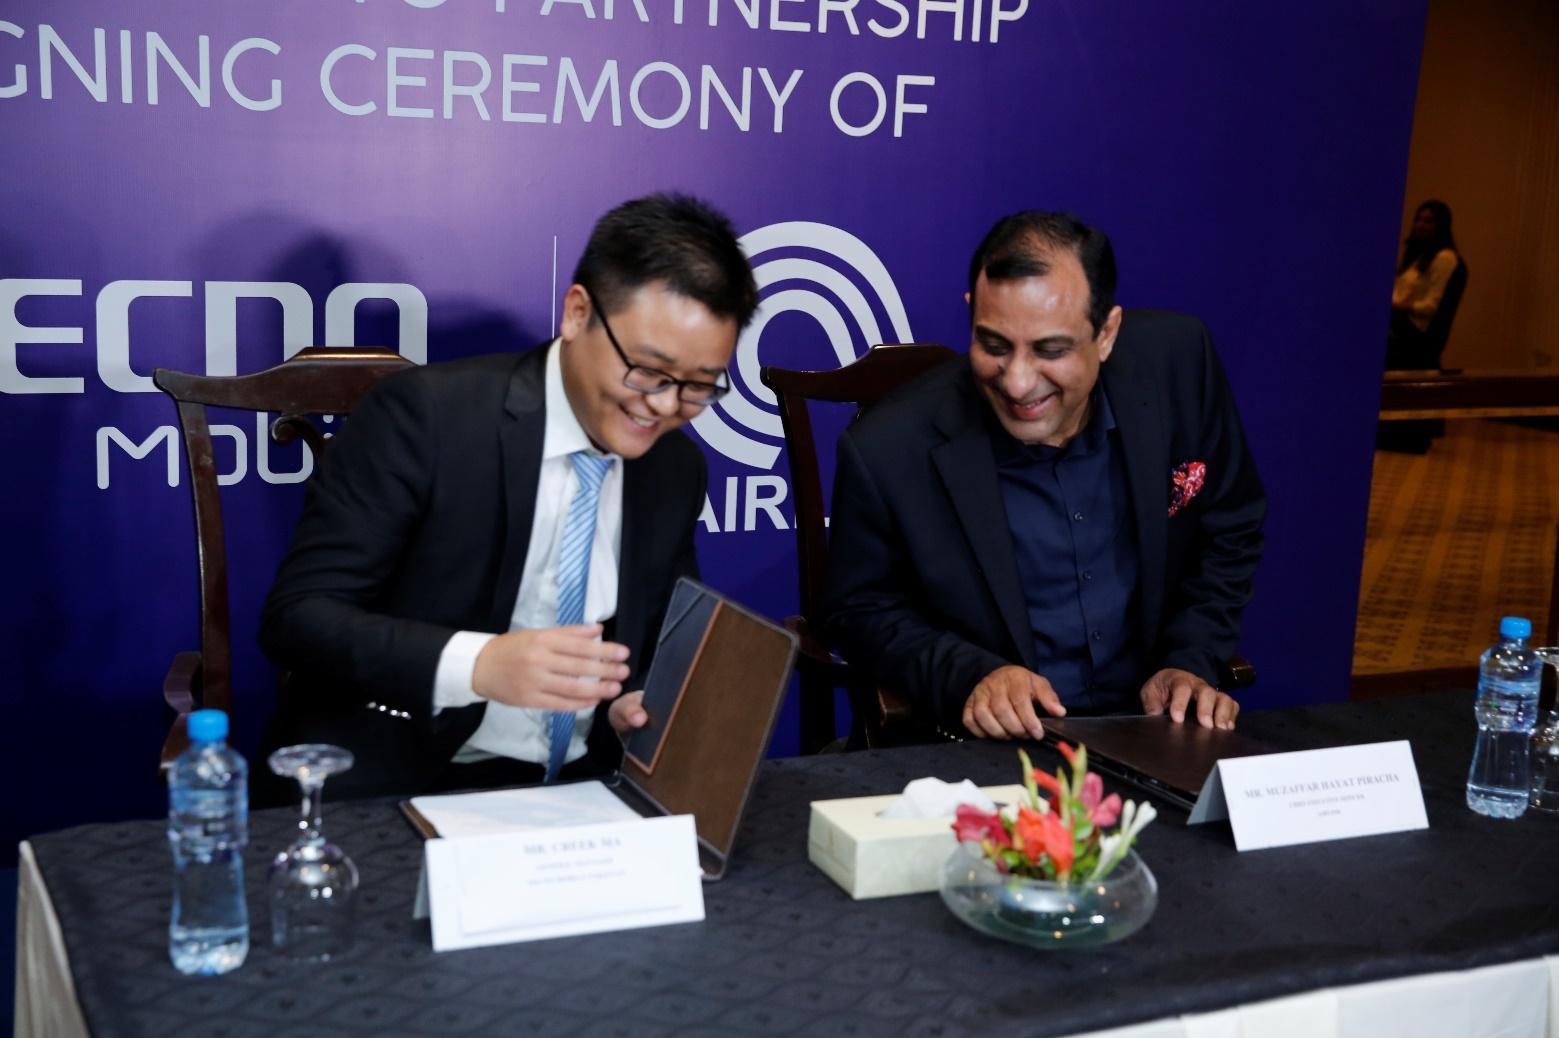 C:UsersSairaDesktopSocial MediaMr. Creek Ma ( CEO Tecno Mobile Pakistan) and Mr Muzaffar Piracha ( CEO Airlink) signing partnership contract.JPG